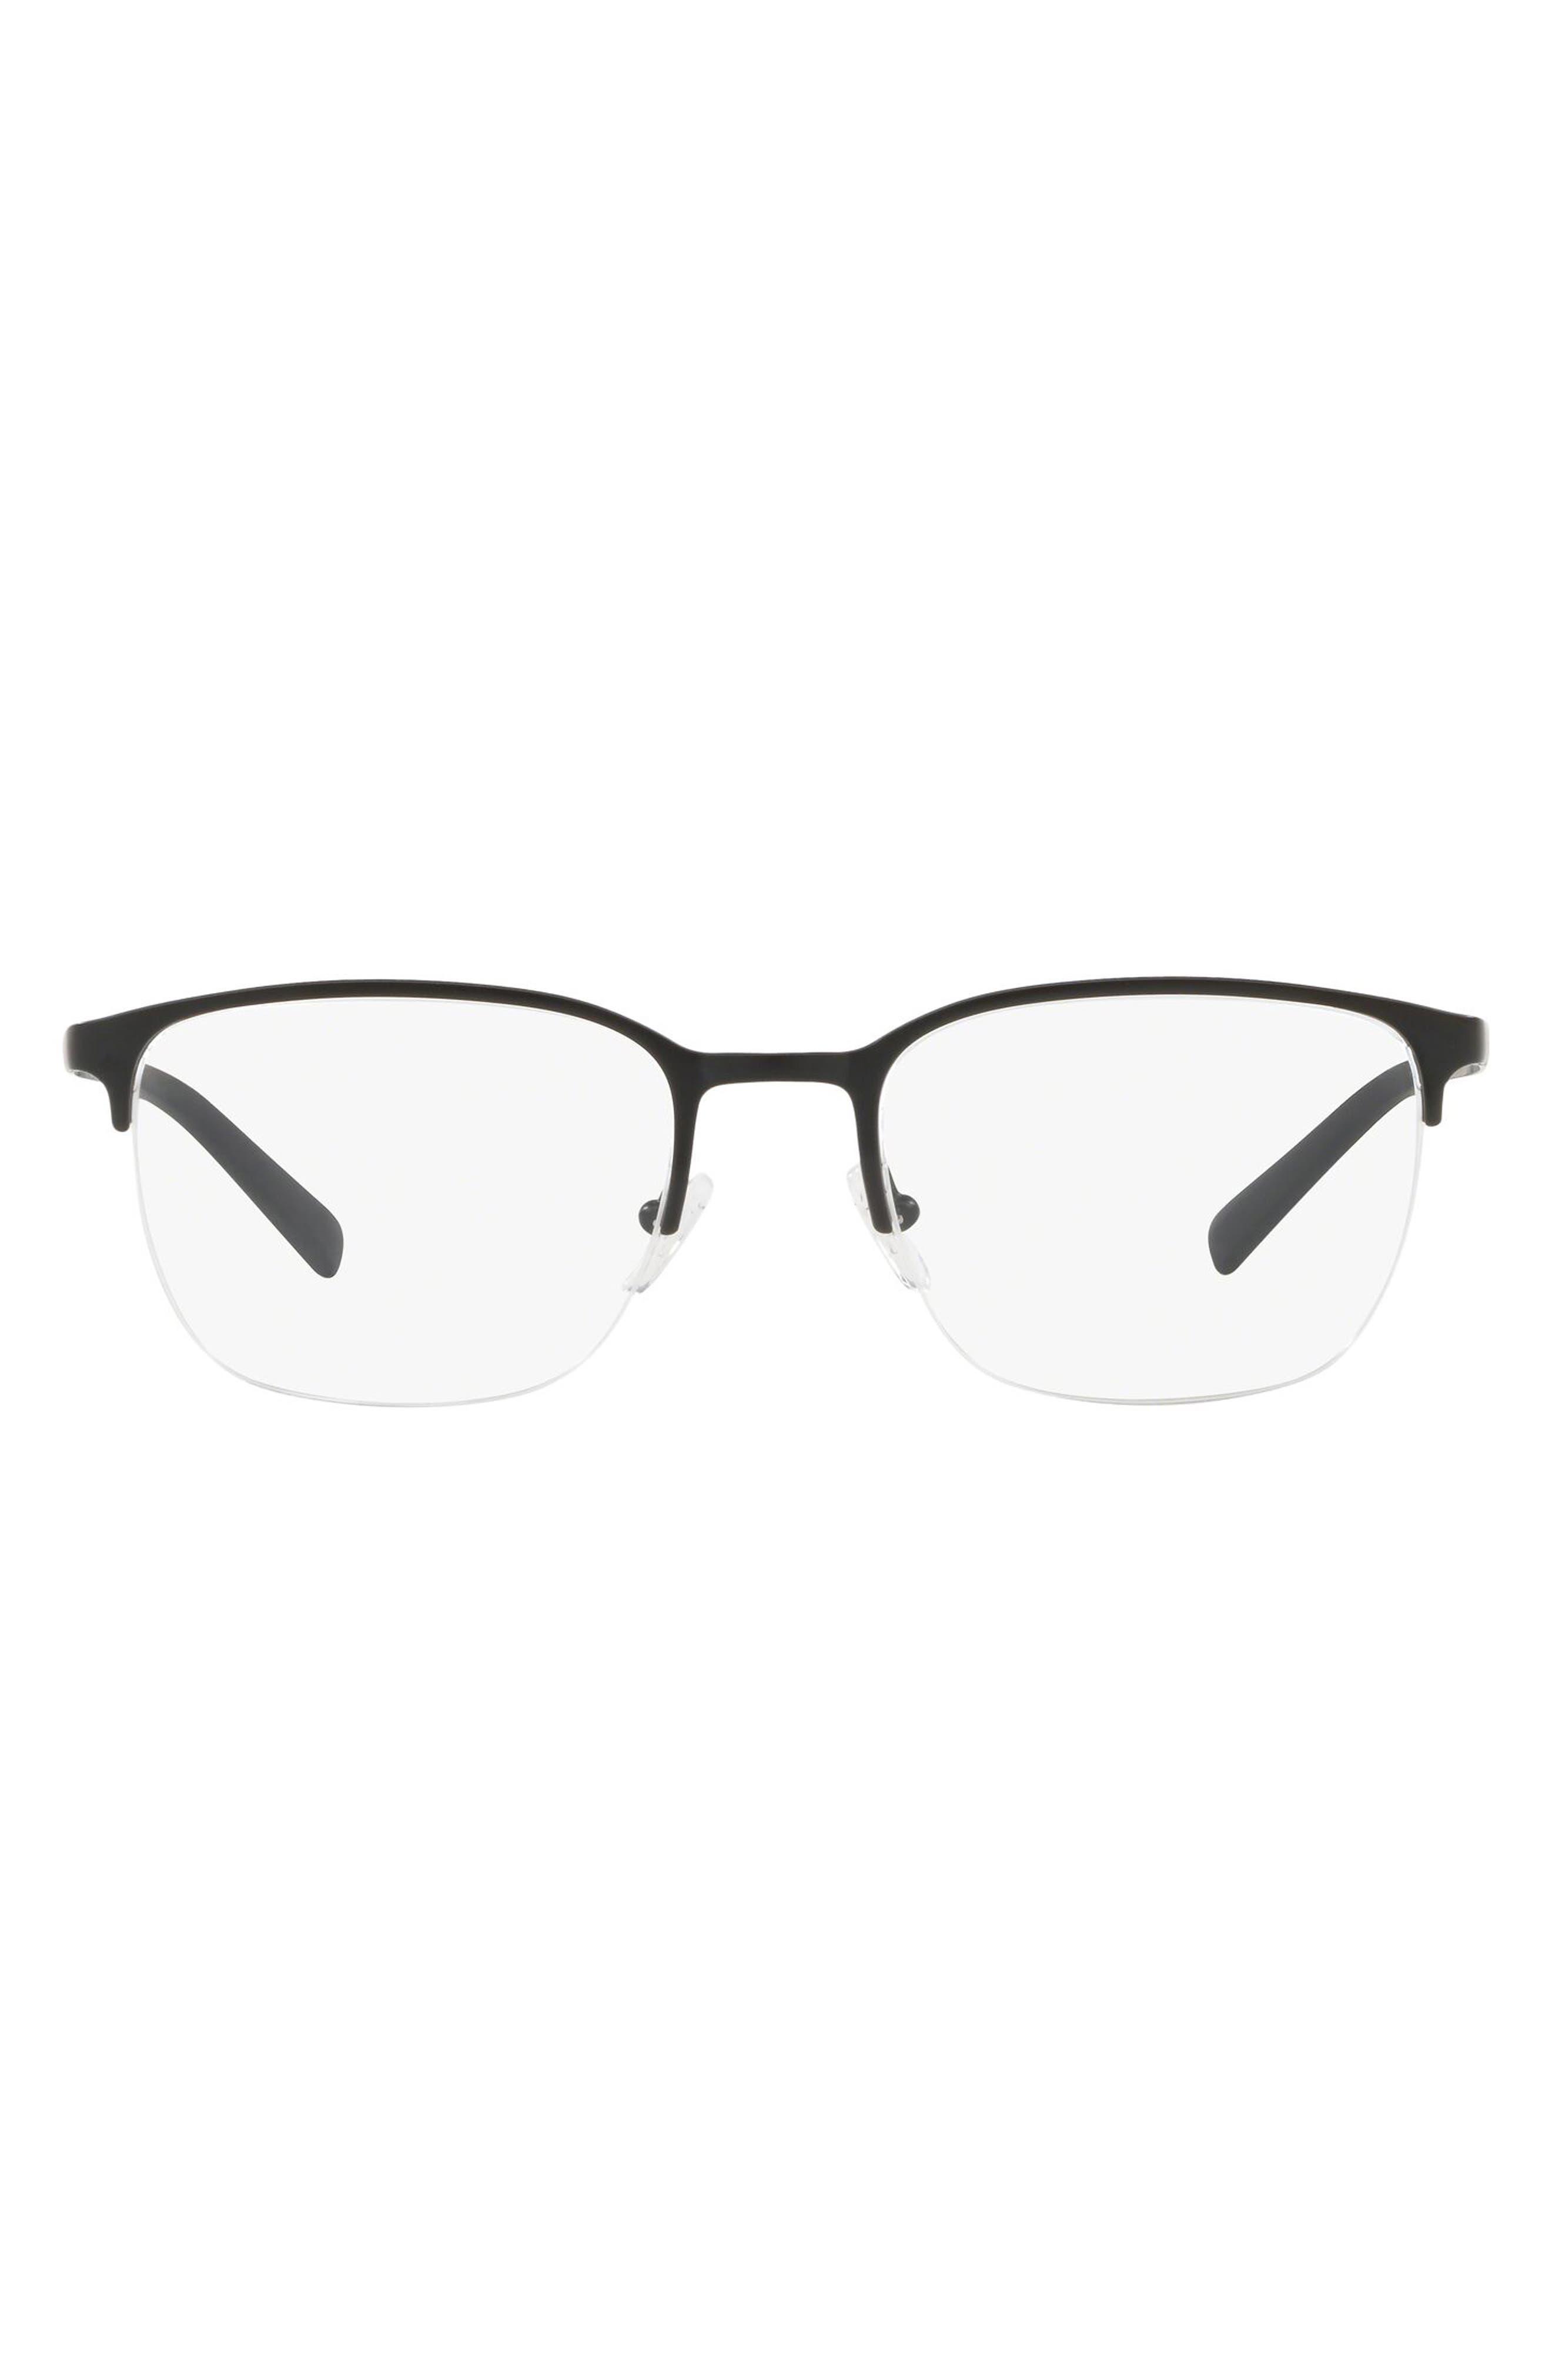 53mm Semirimless Optical Glasses